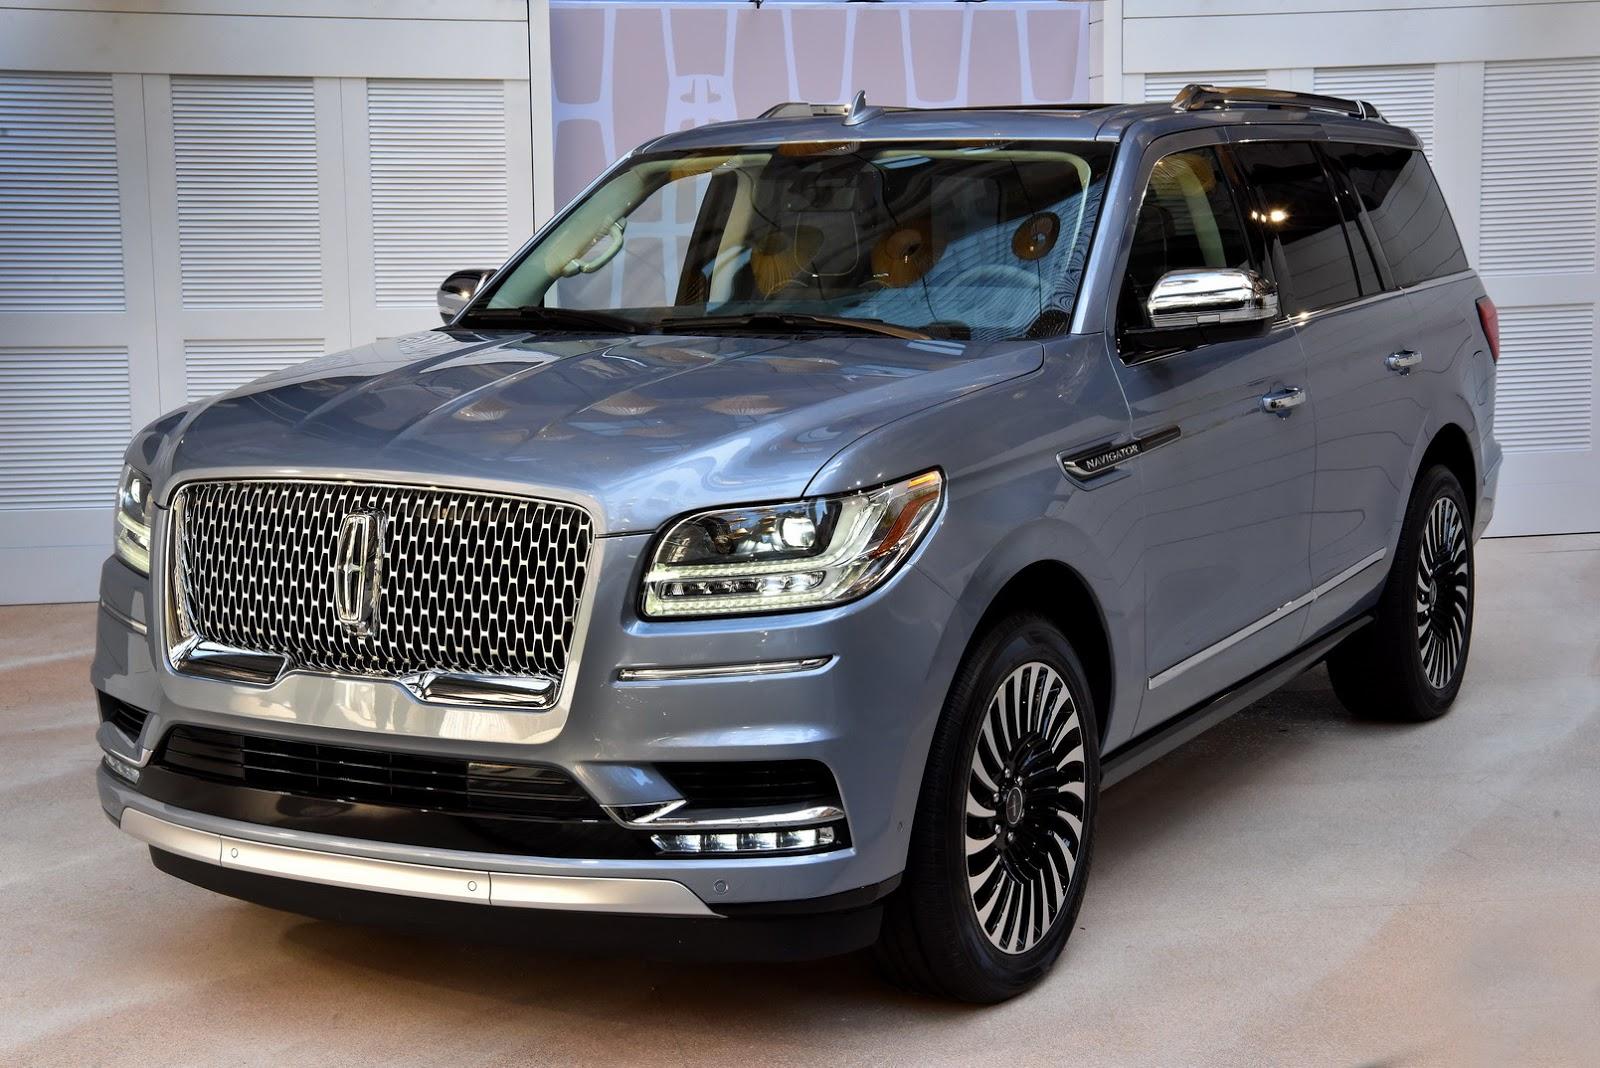 Lincoln Navigator 2018 — фотогалерея